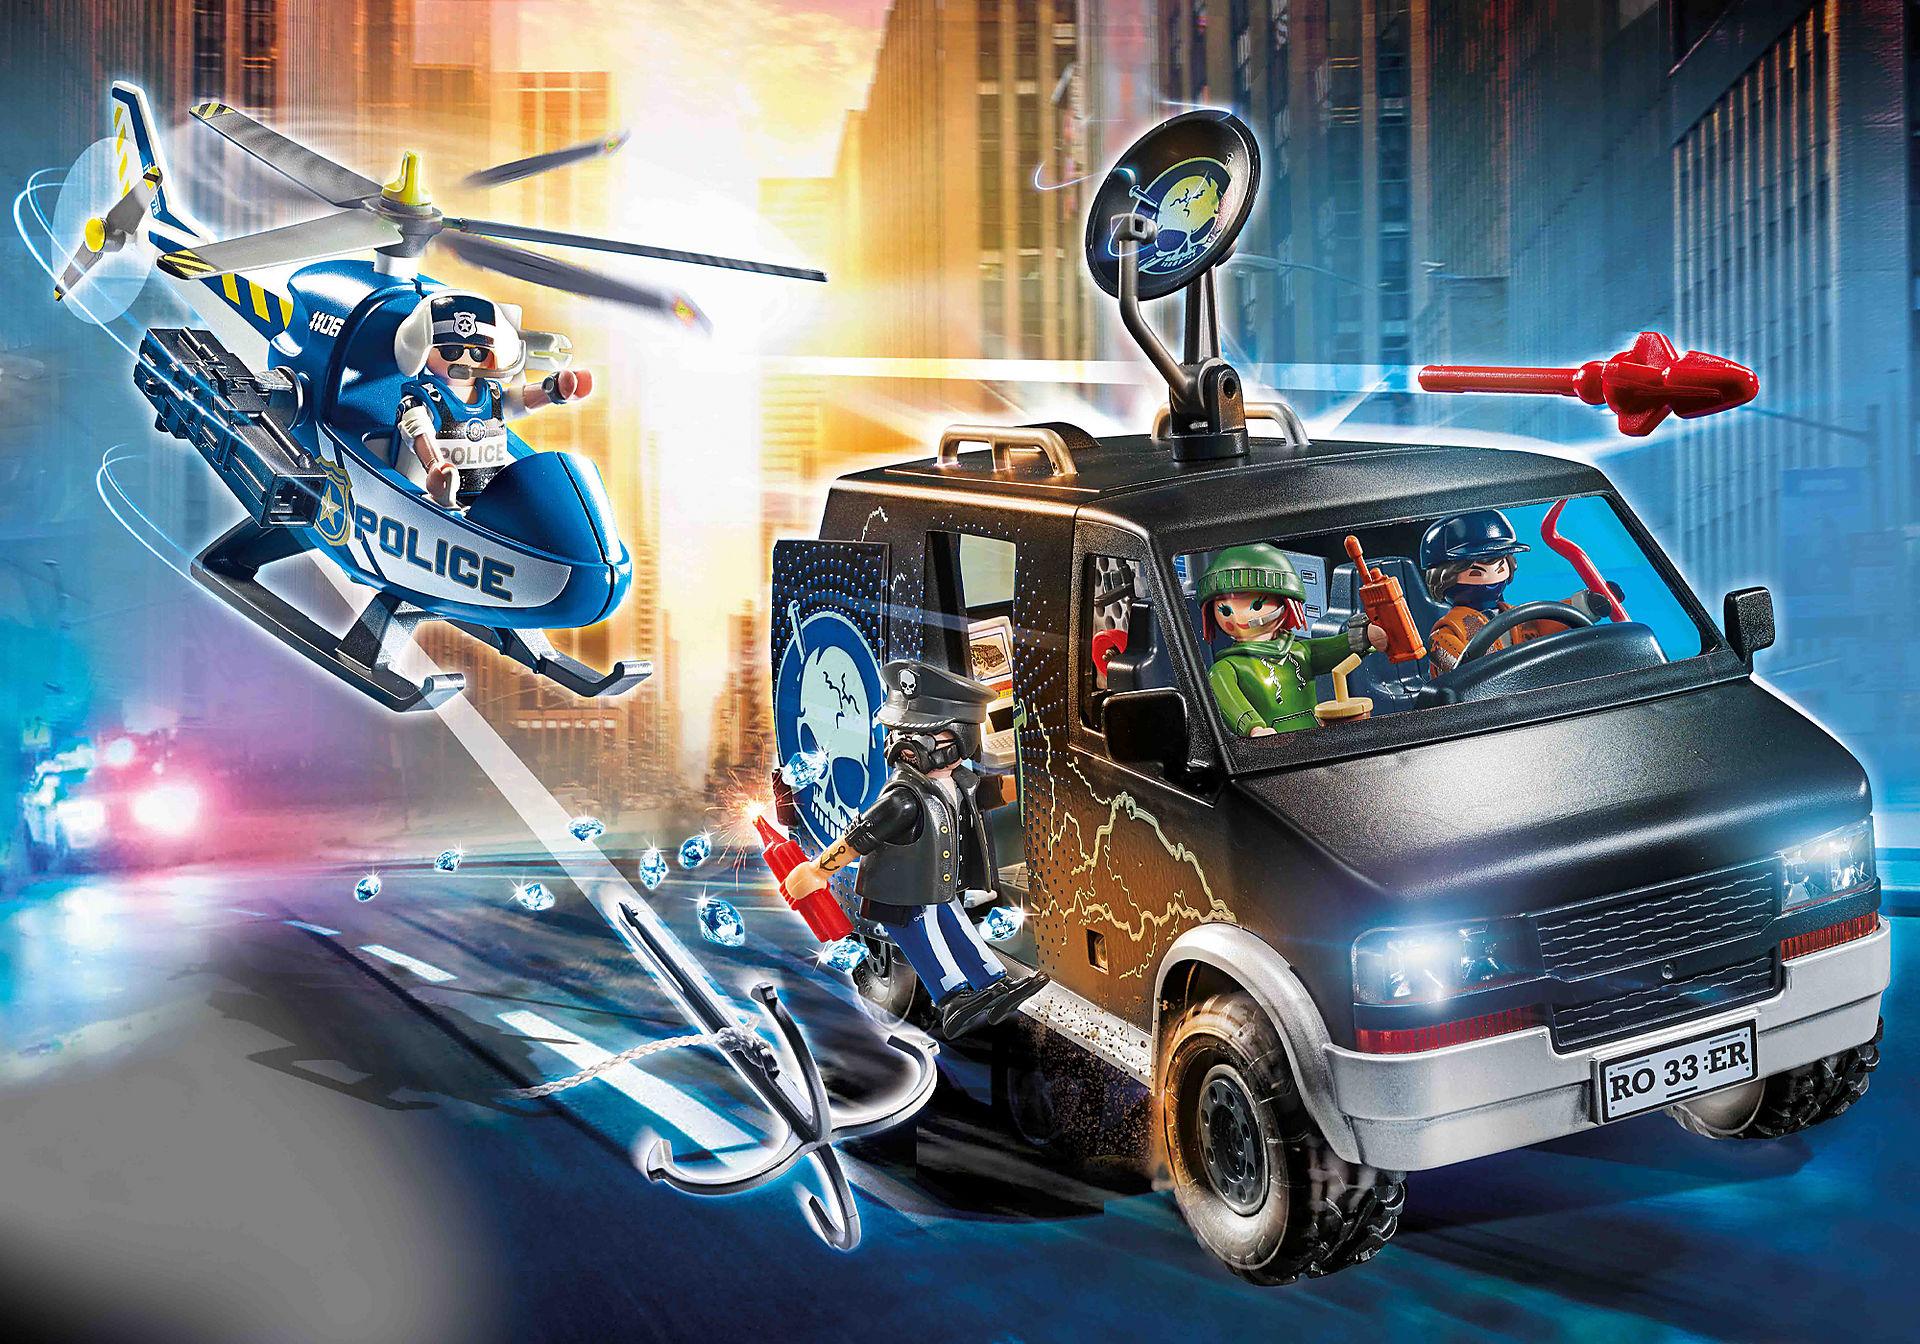 70575 Helicopter Pursuit with Runaway Van zoom image1